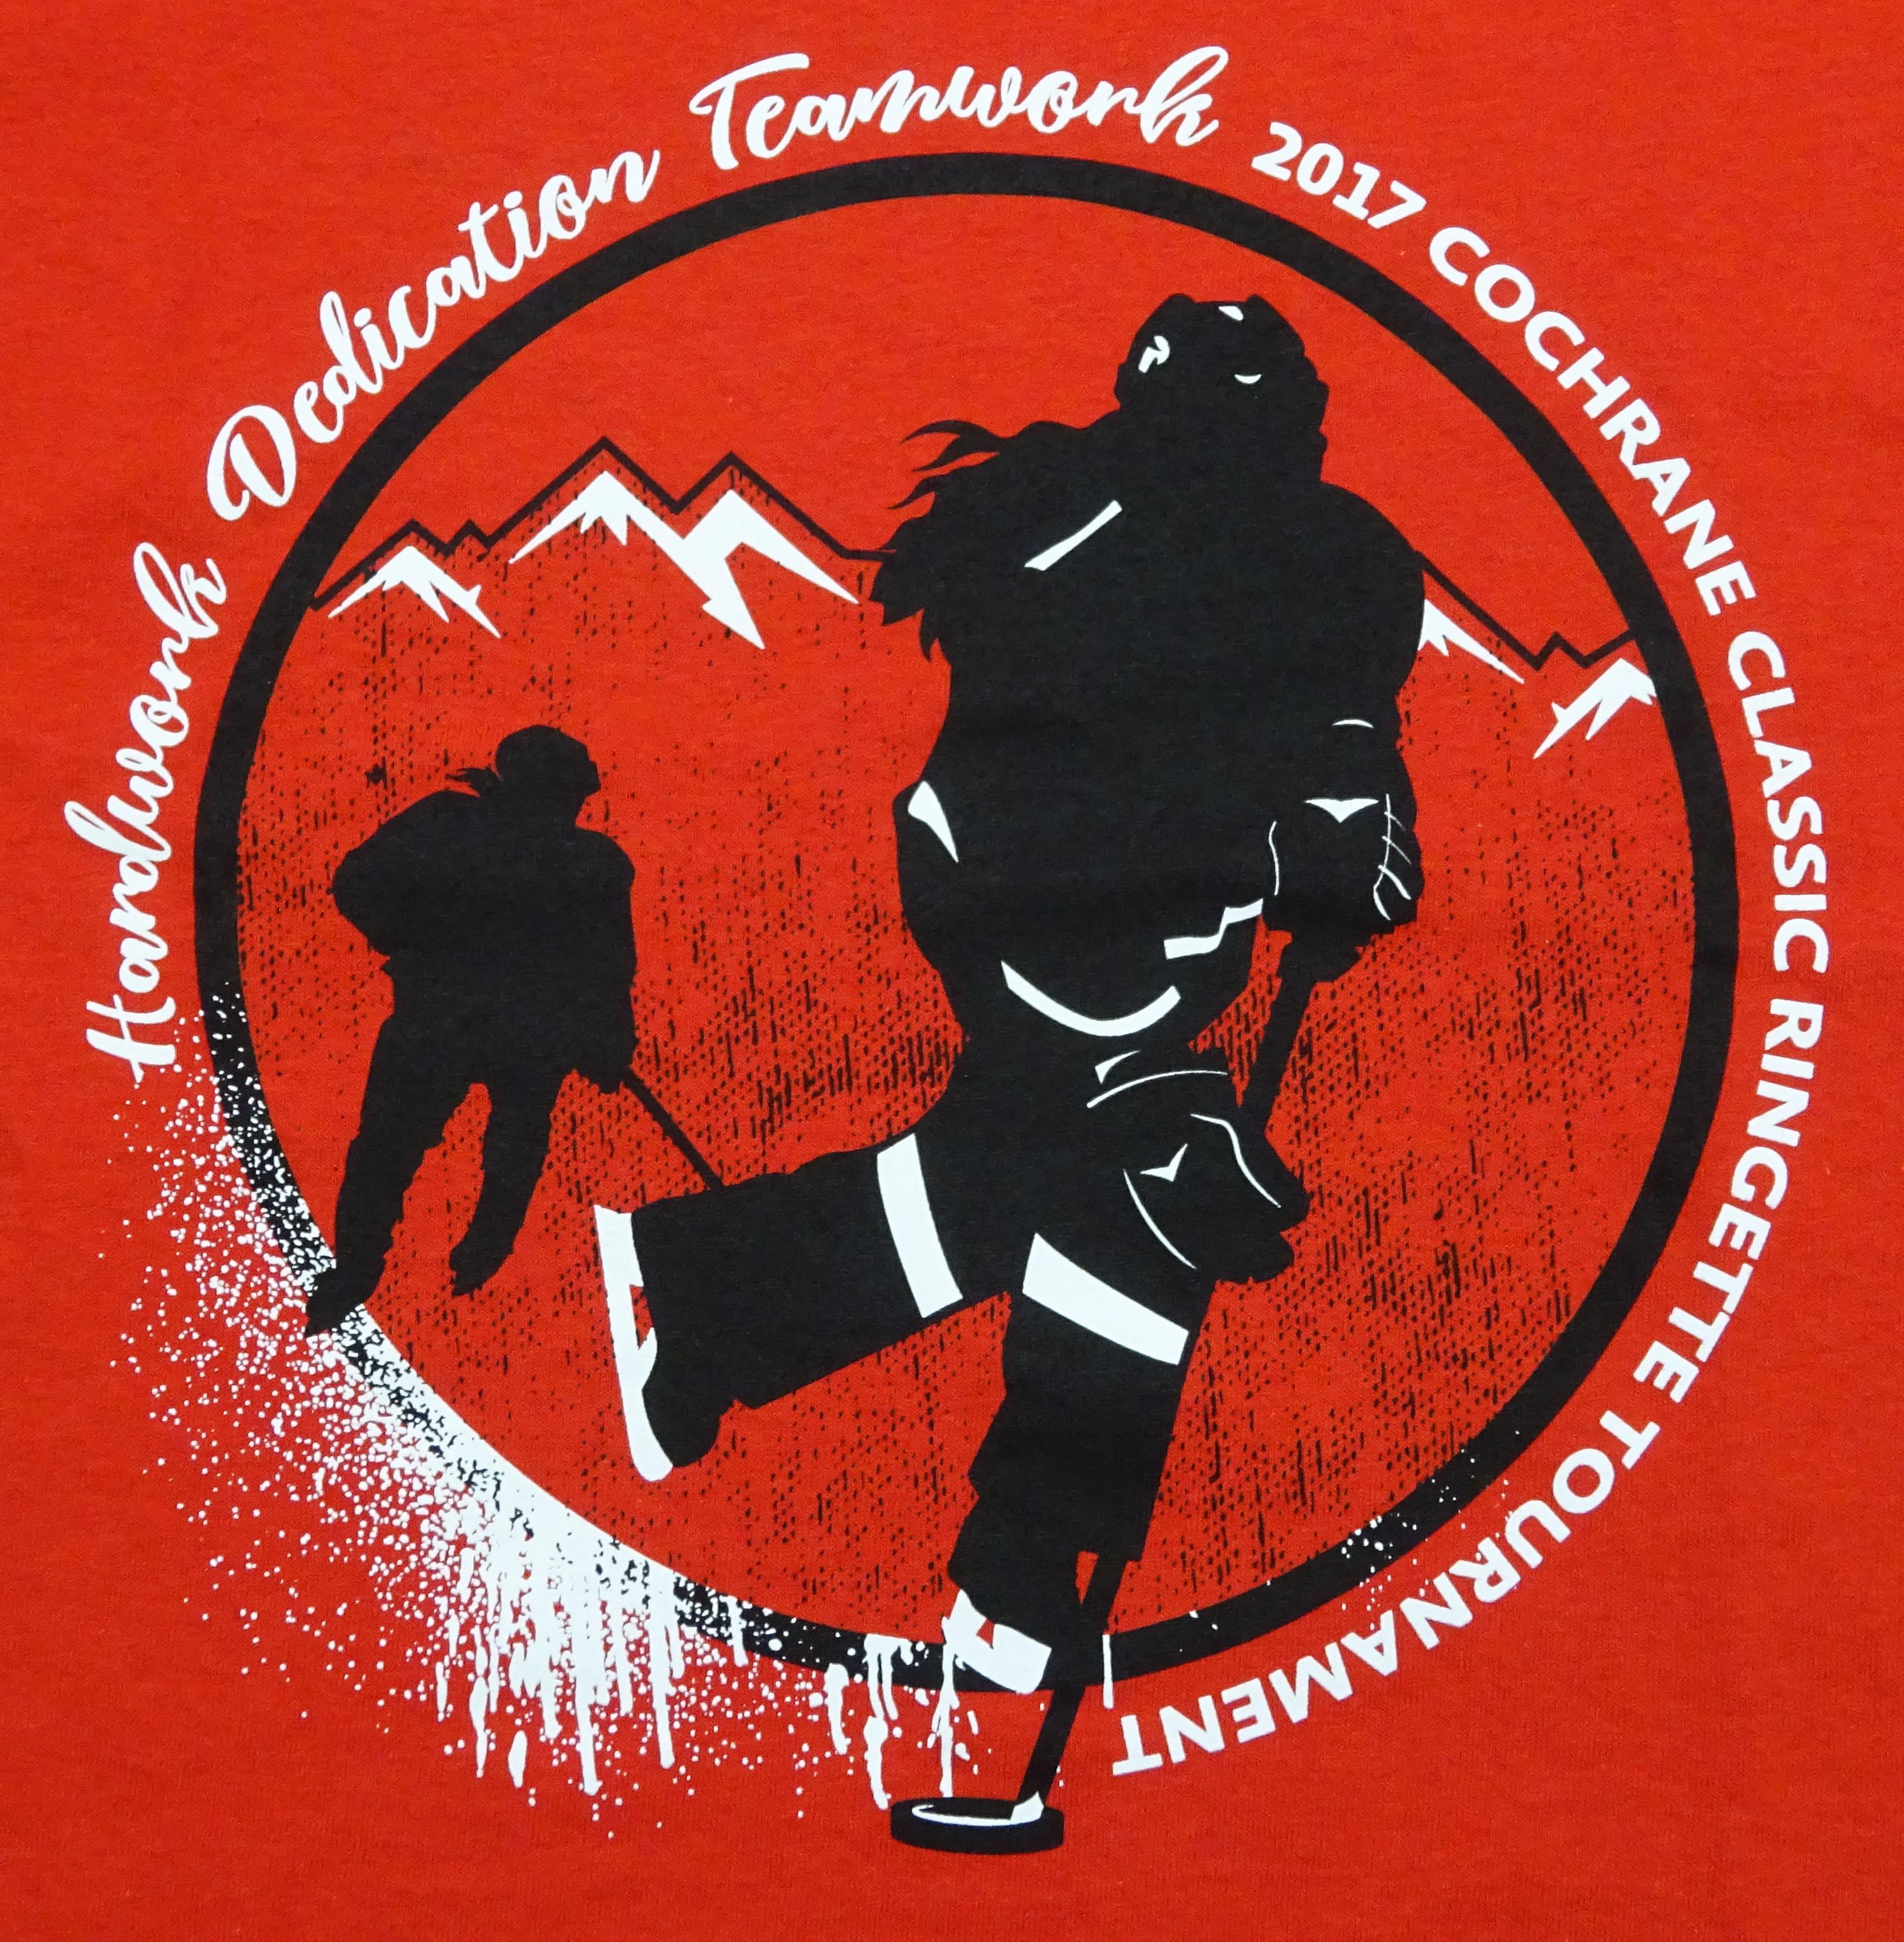 https://0901.nccdn.net/4_2/000/000/024/ec9/Calgary-sports-teams-custom-shirts-screenprint.jpg